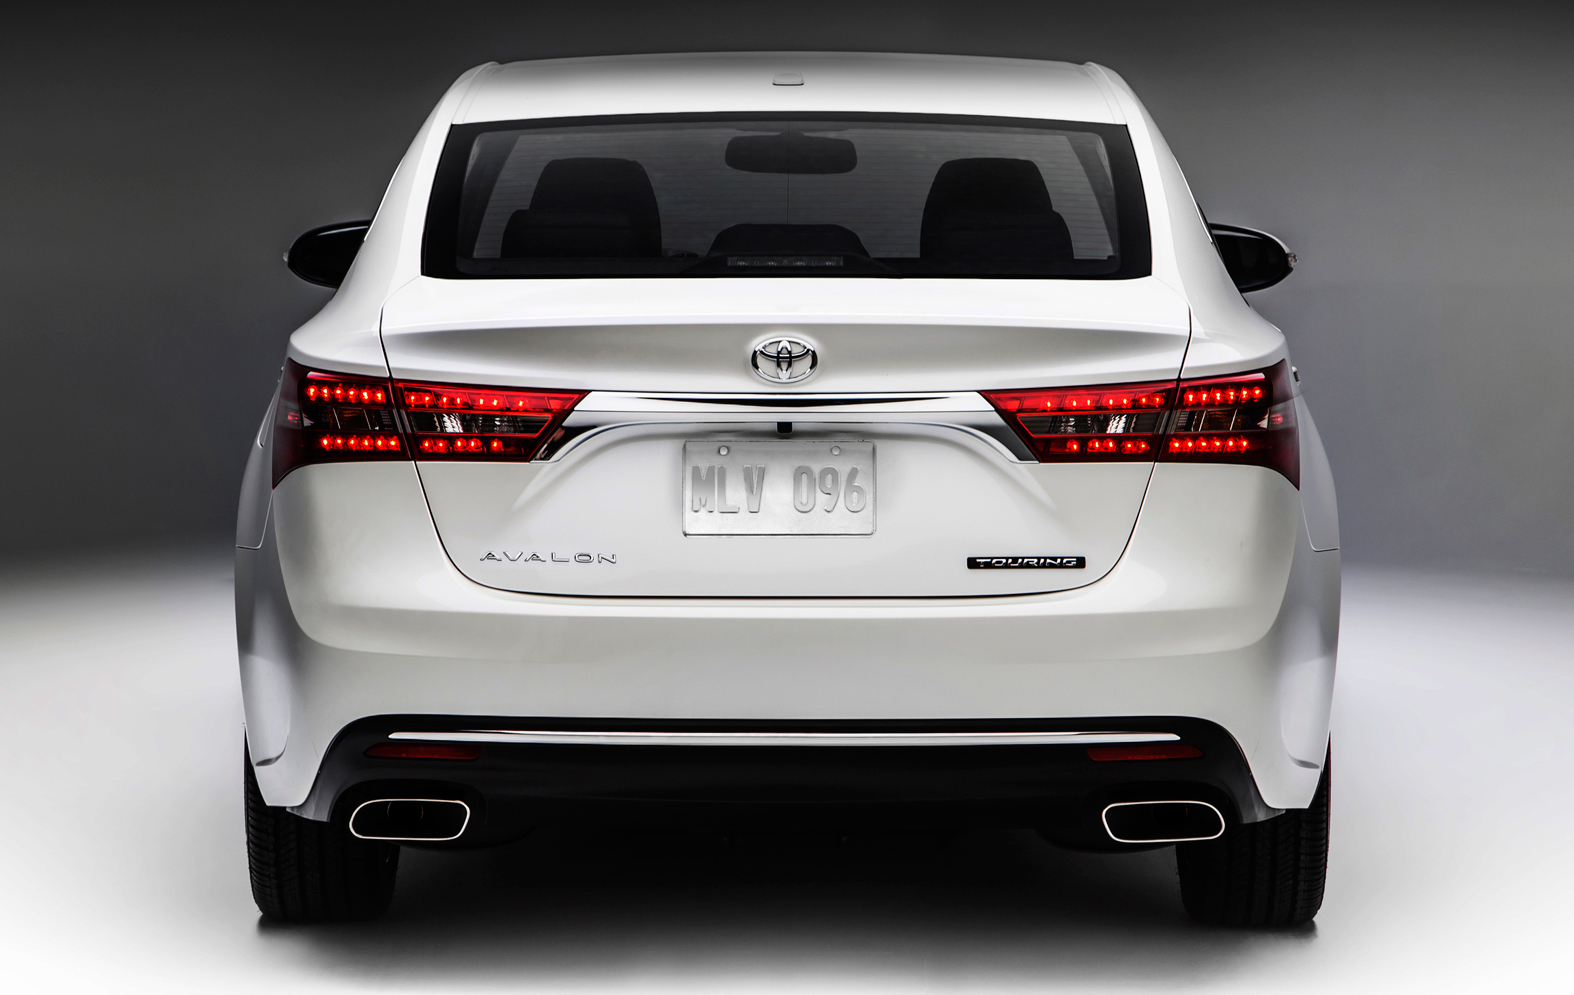 Toyota Avalon rear